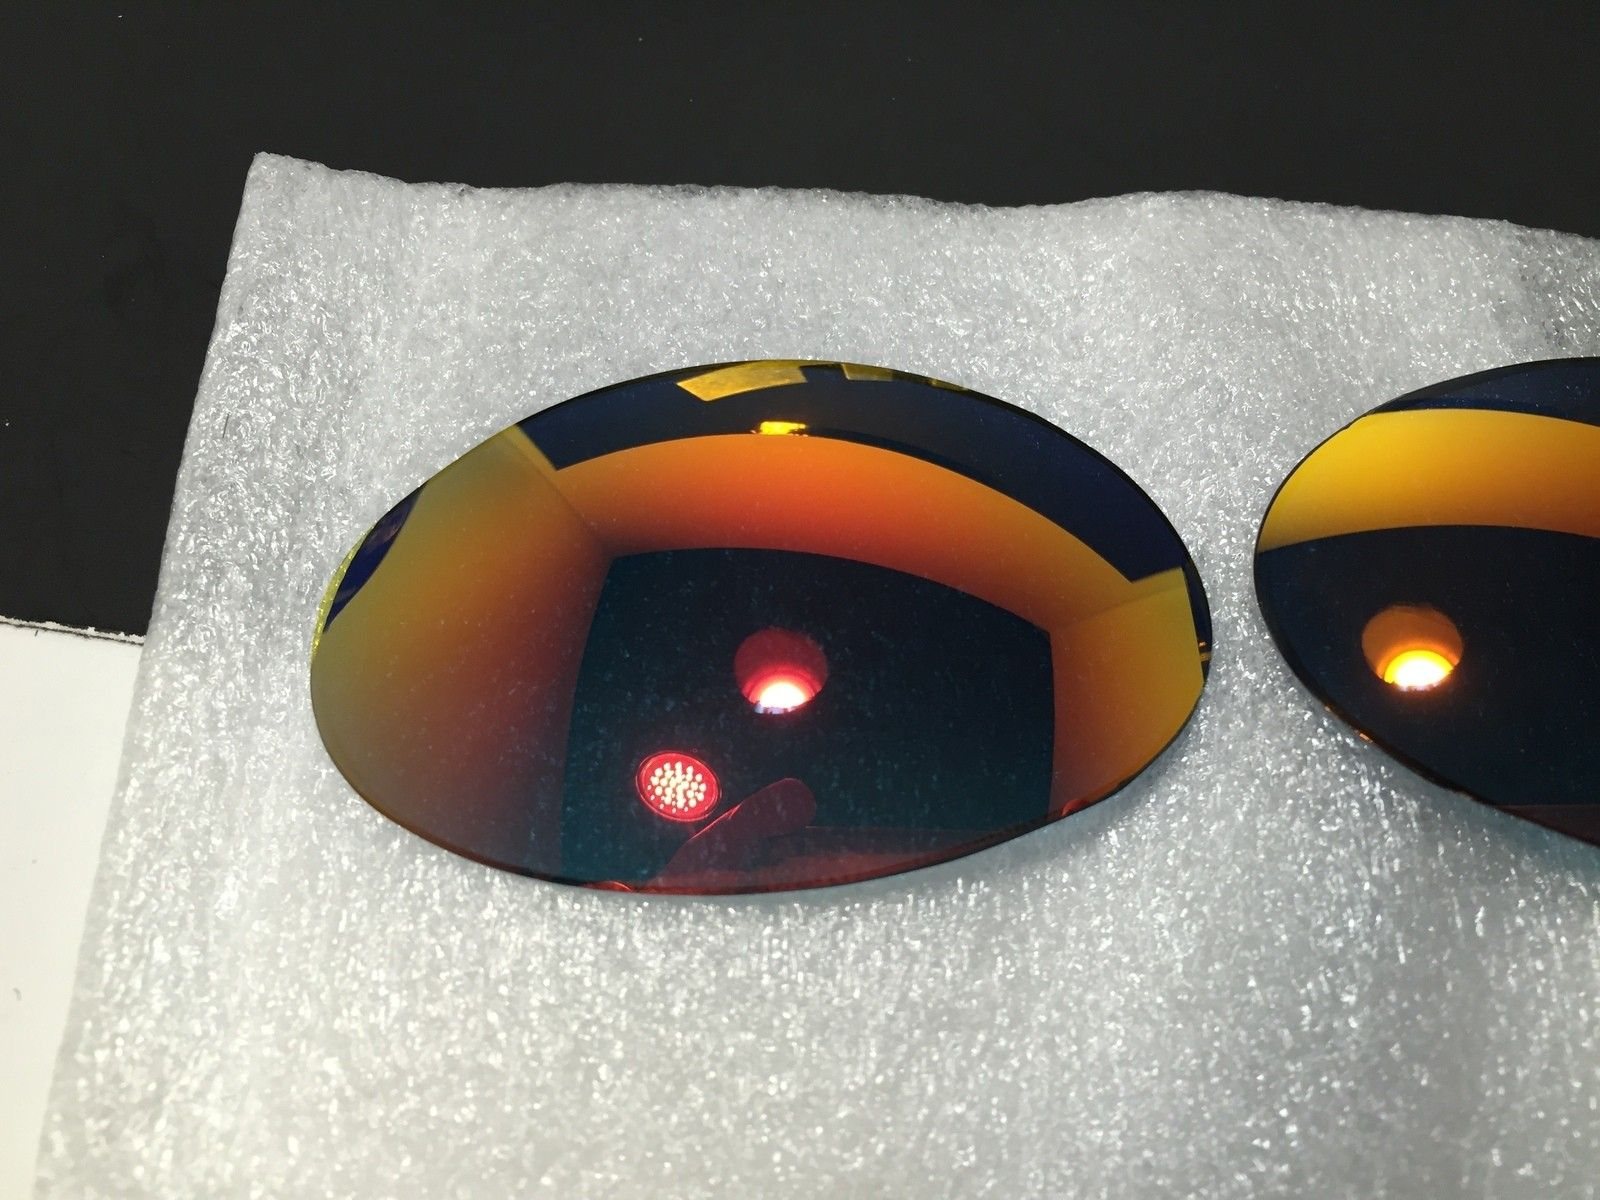 Custom Lenses Romeo 1 Ruby and Juliet Pos Red both New - IMG_1826_2.JPG